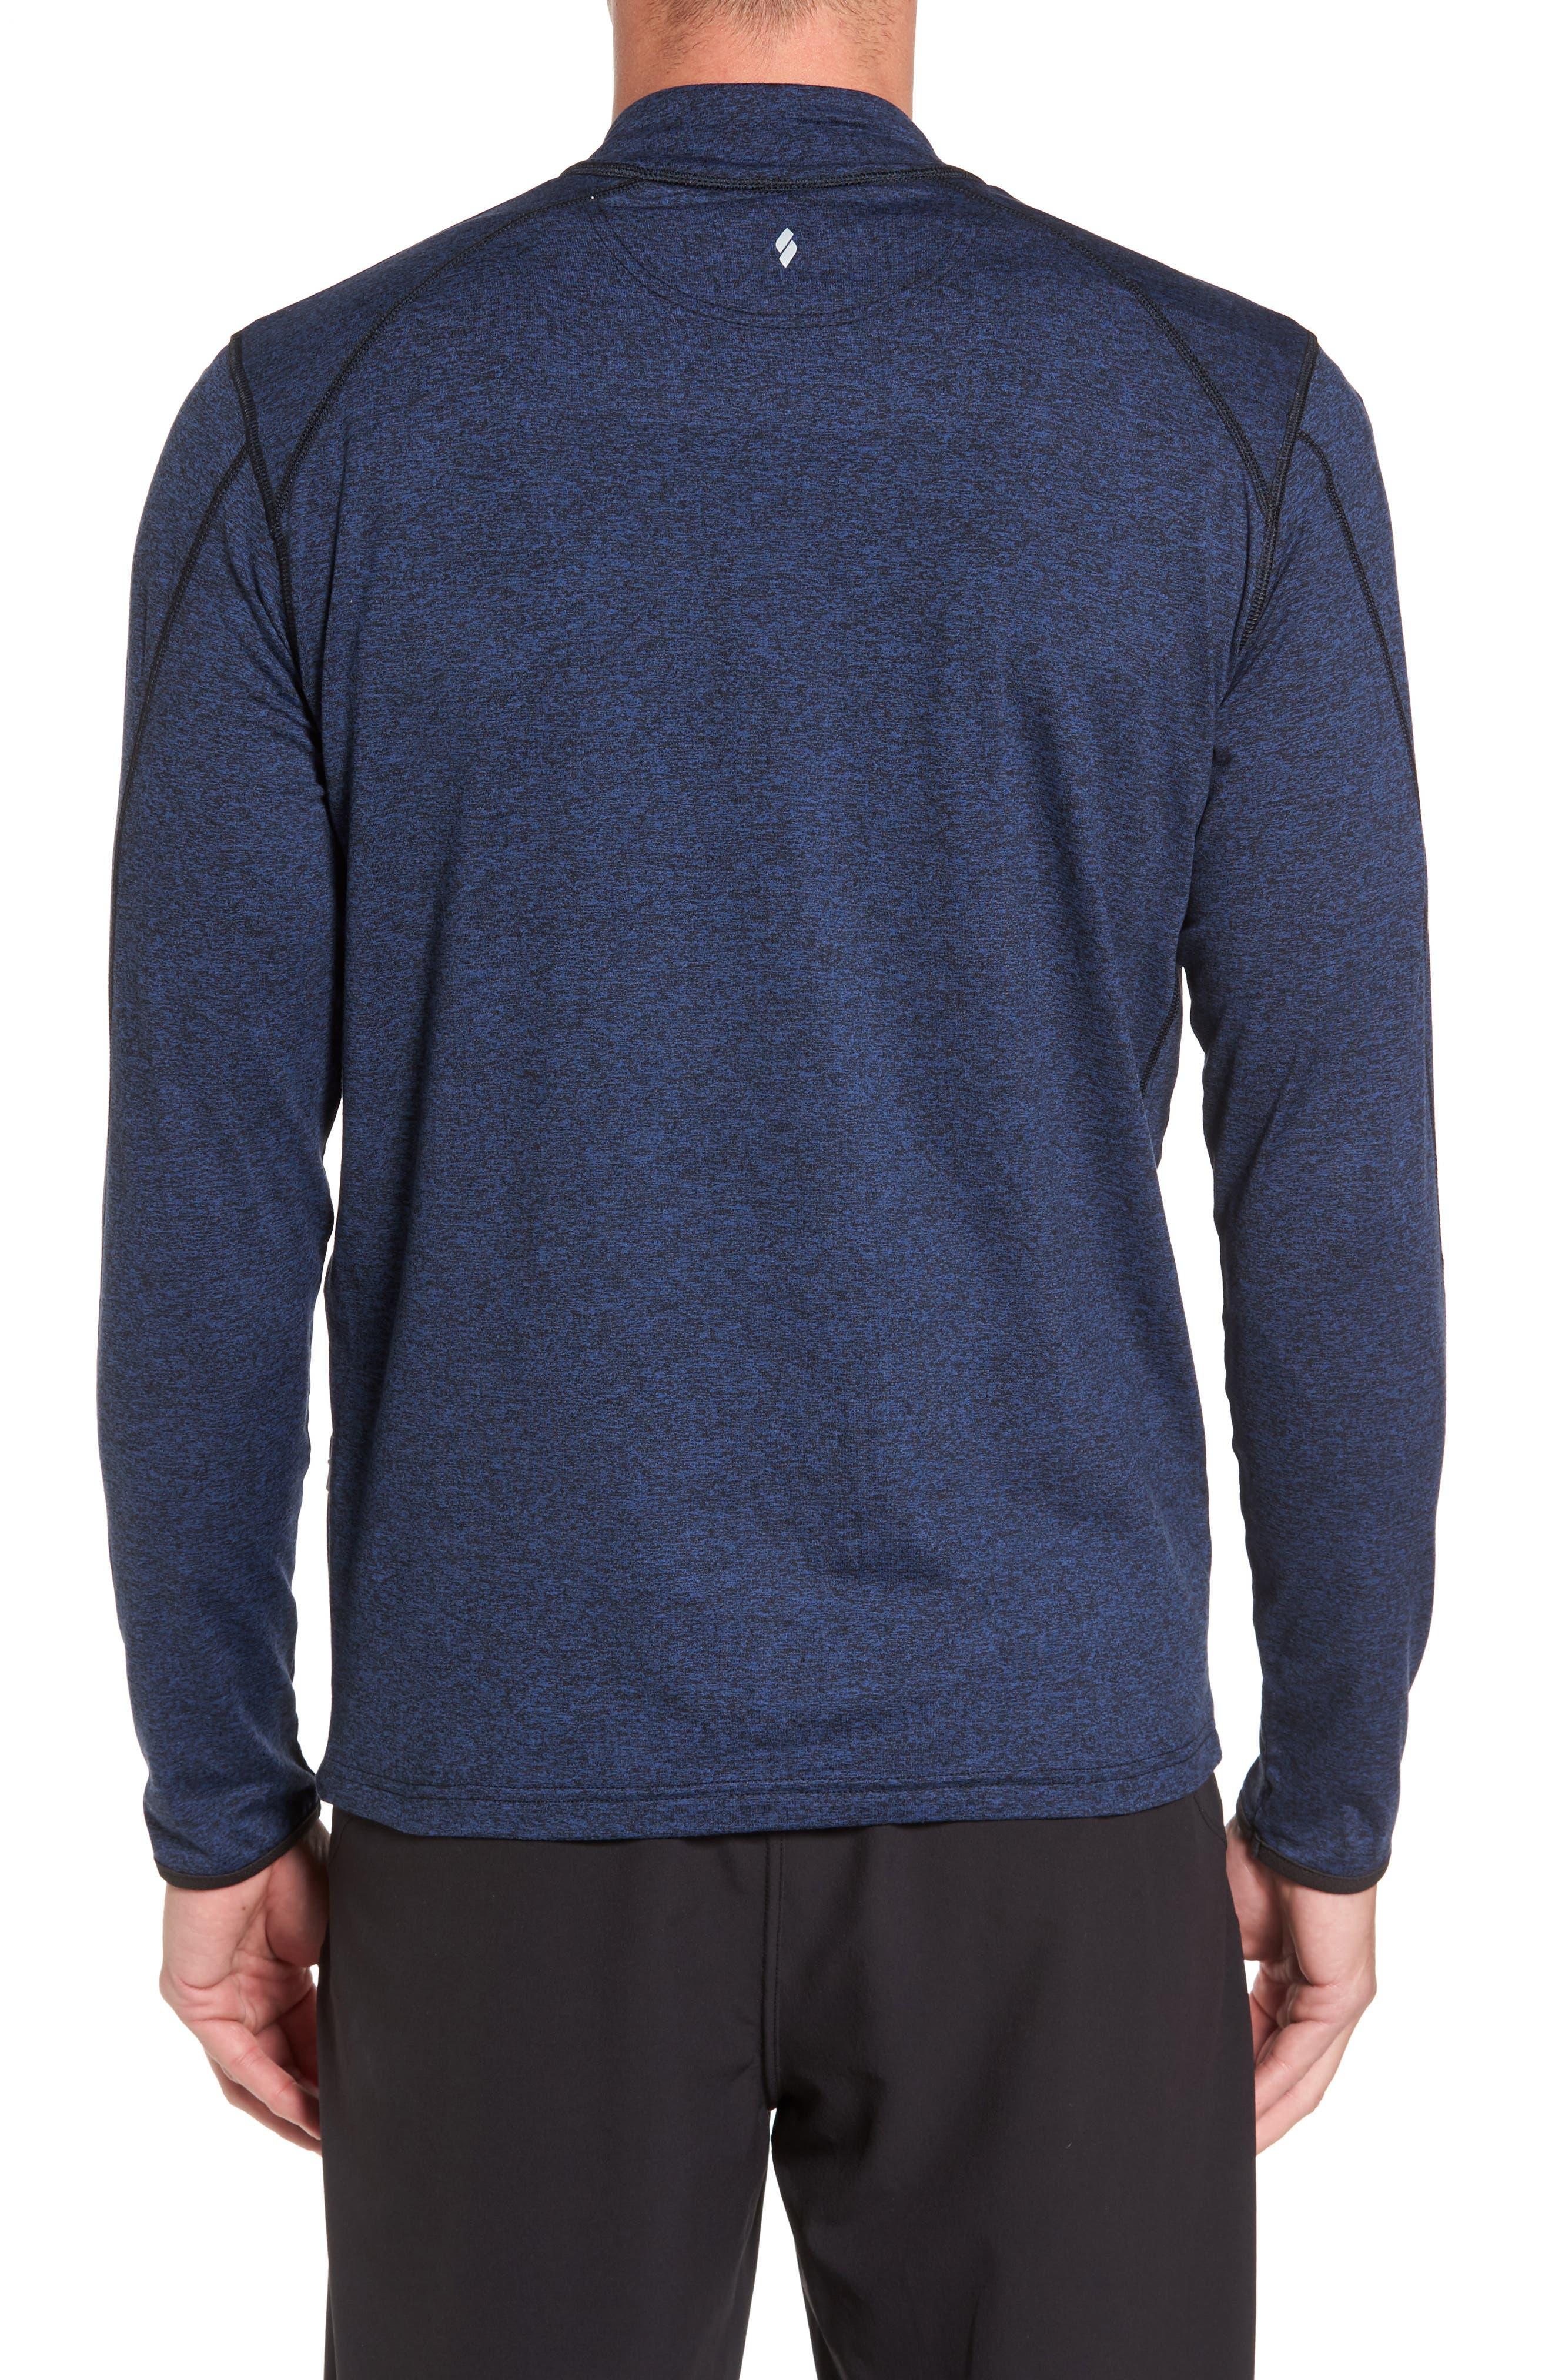 'Elevate' Moisture Wicking Stretch Quarter Zip Pullover,                             Alternate thumbnail 2, color,                             Navy Black/ Black/ White